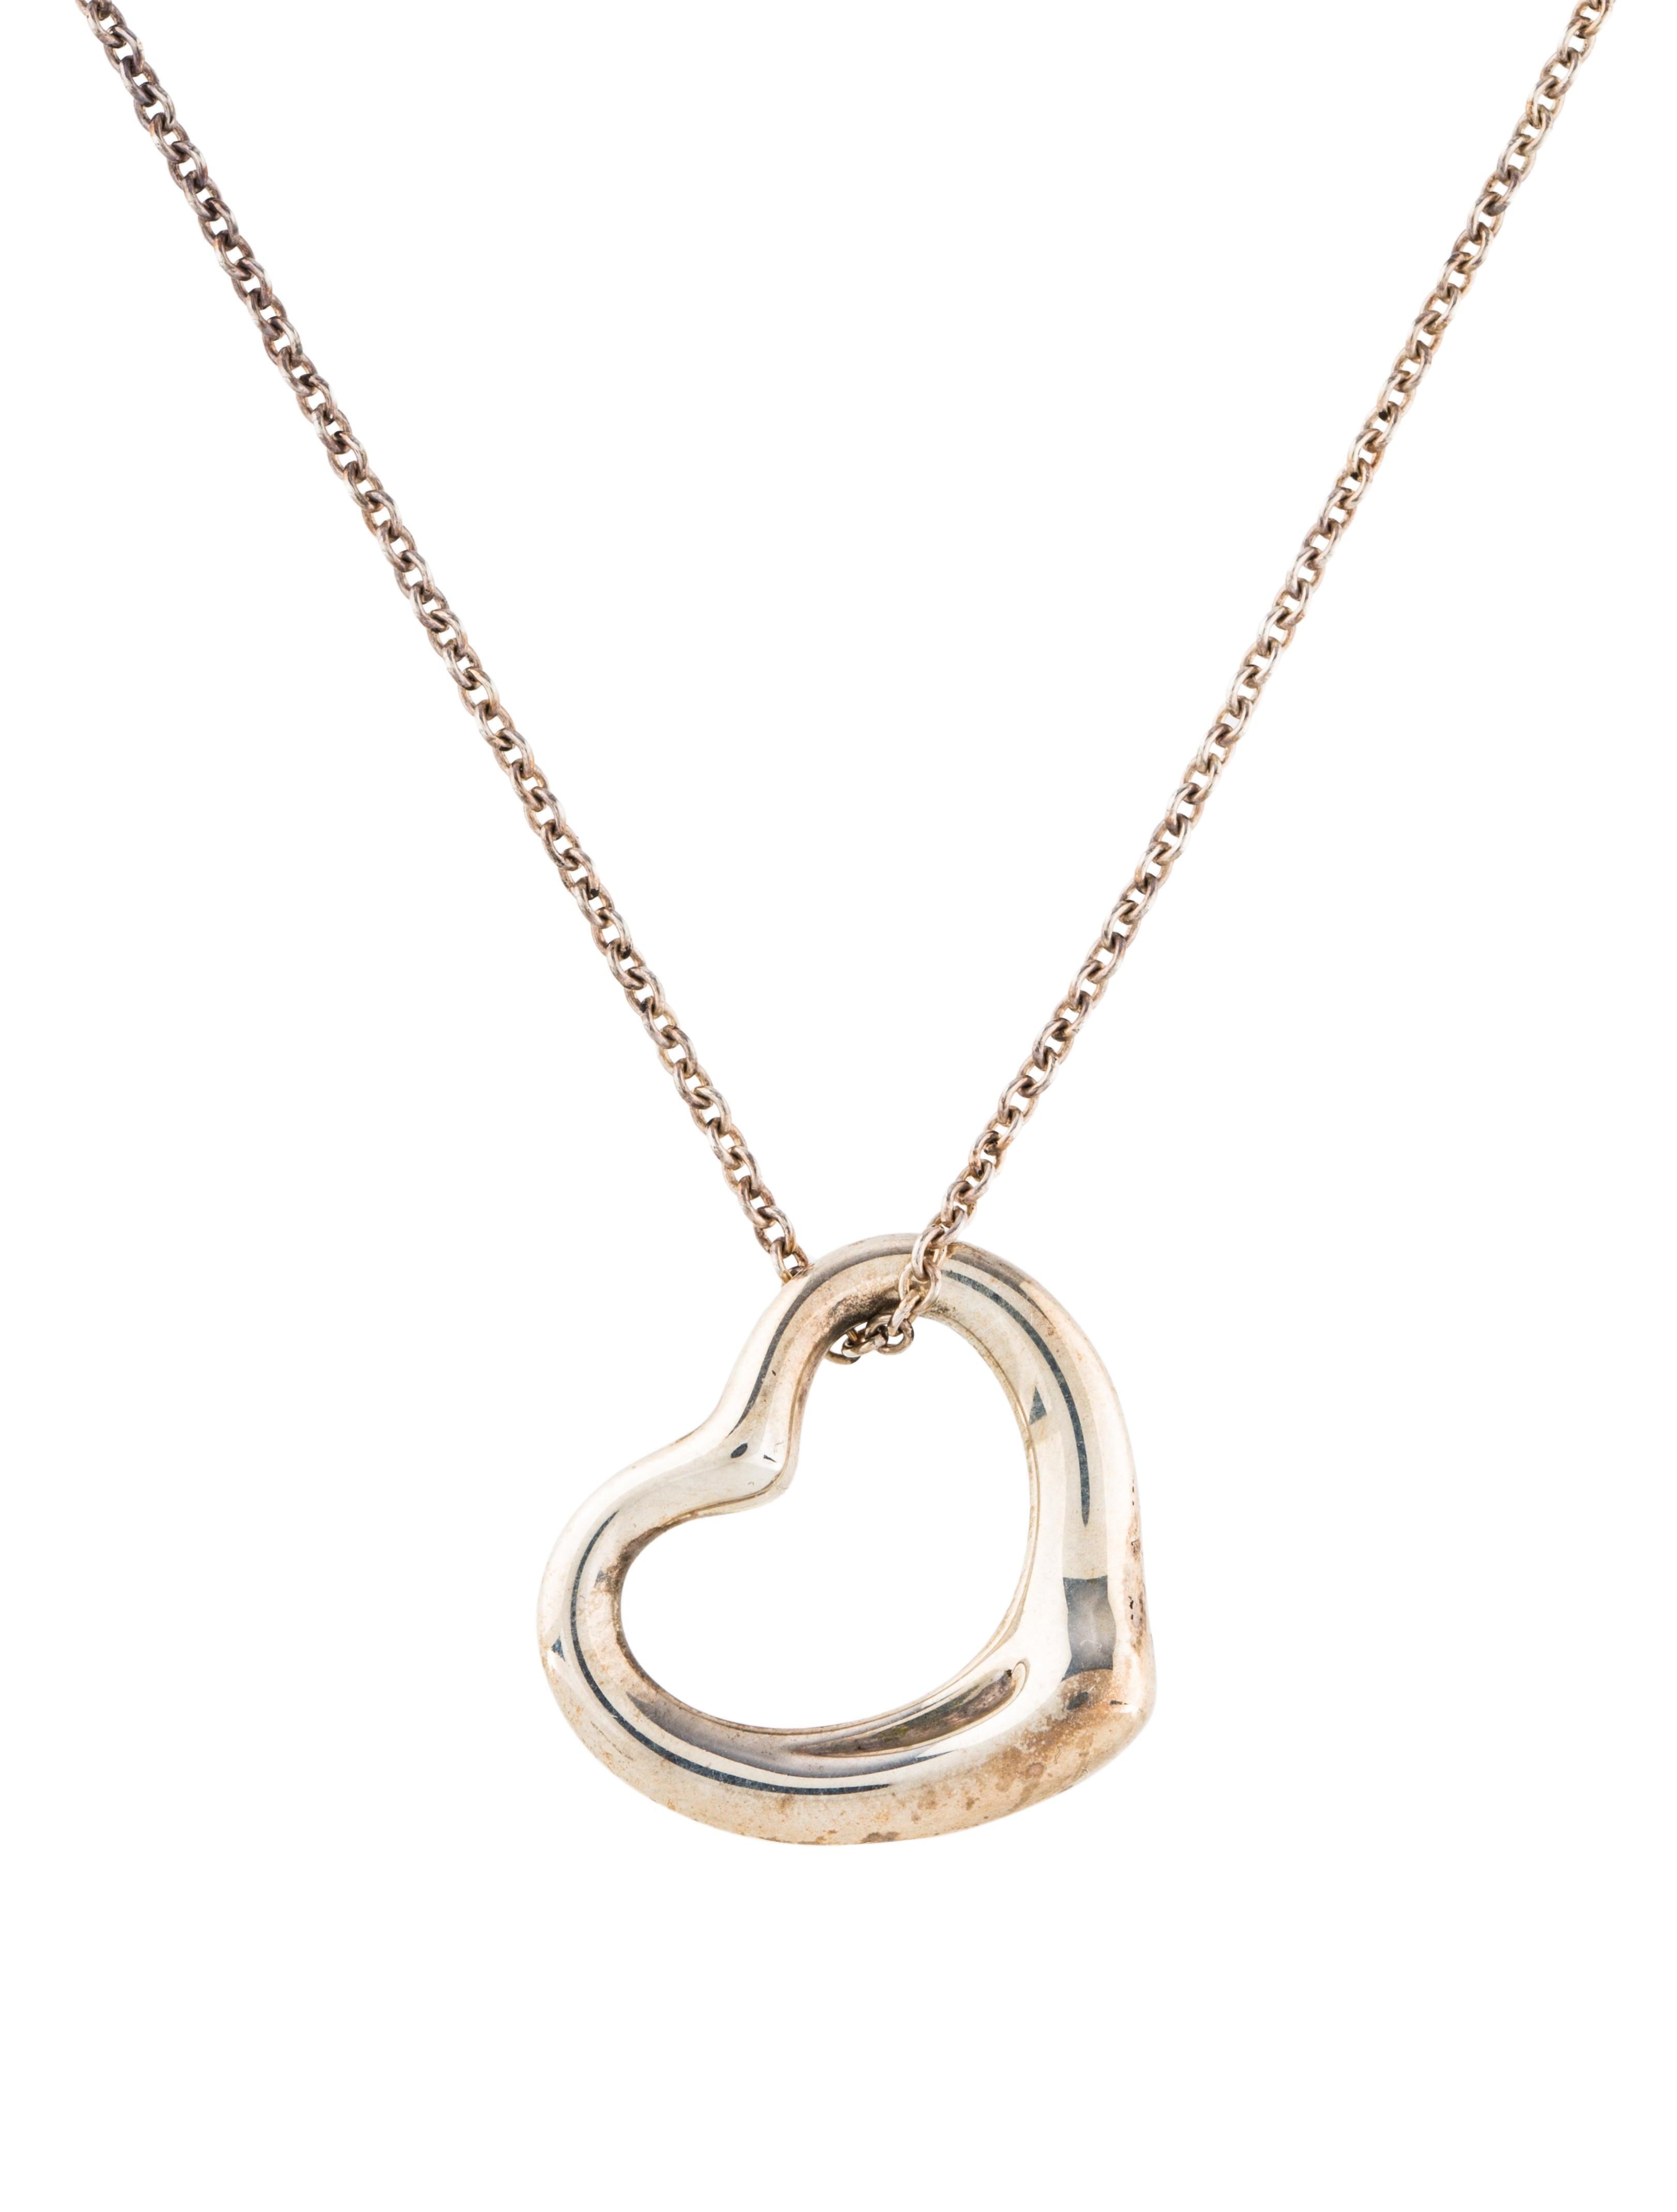 Tiffany co open heart pendant necklace necklaces tif74341 open heart pendant necklace aloadofball Gallery